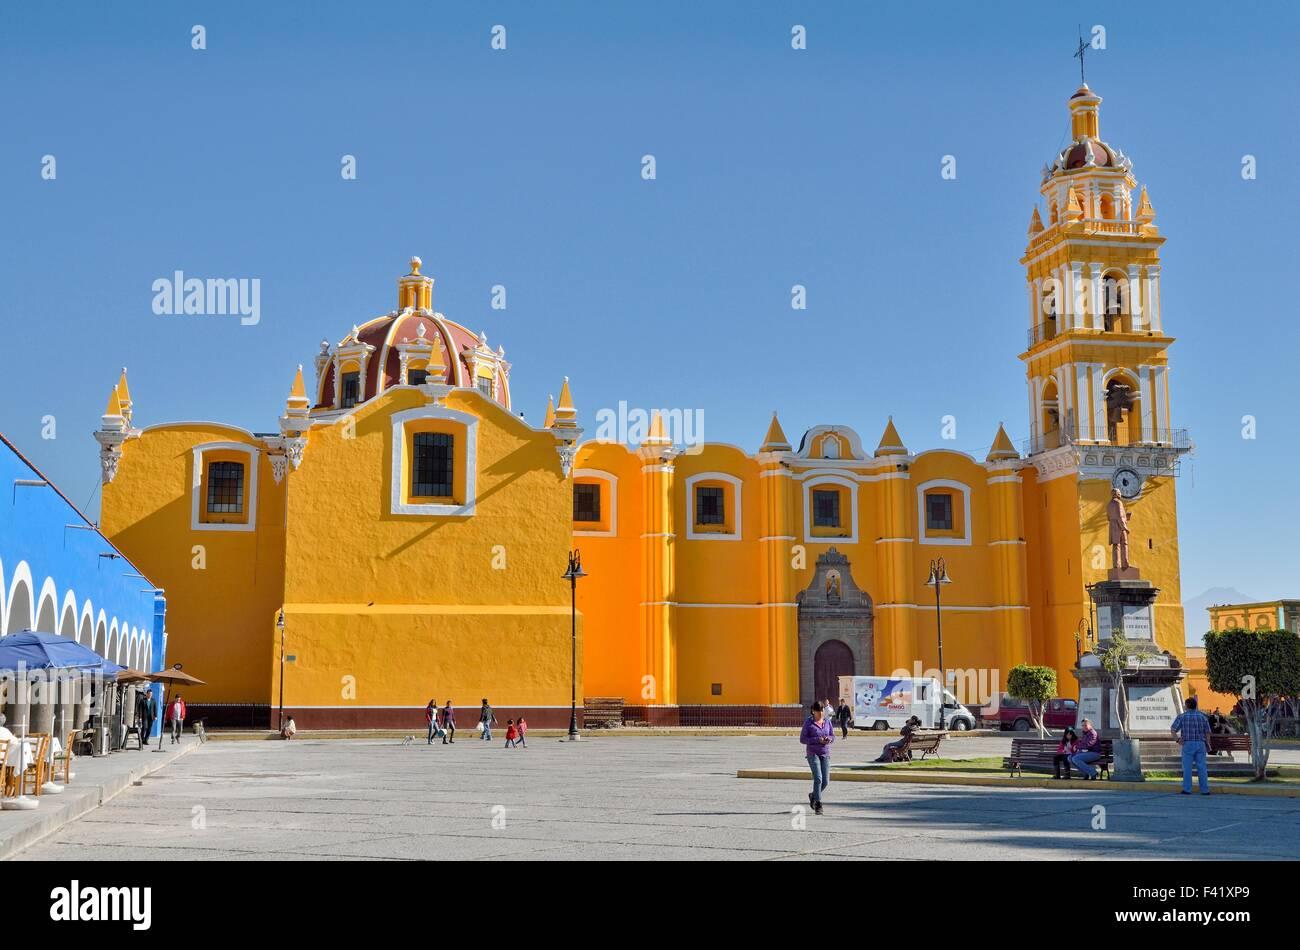 San Pedro Apostle church, Zocalo, Cholula, Puebla, Mexico - Stock Image